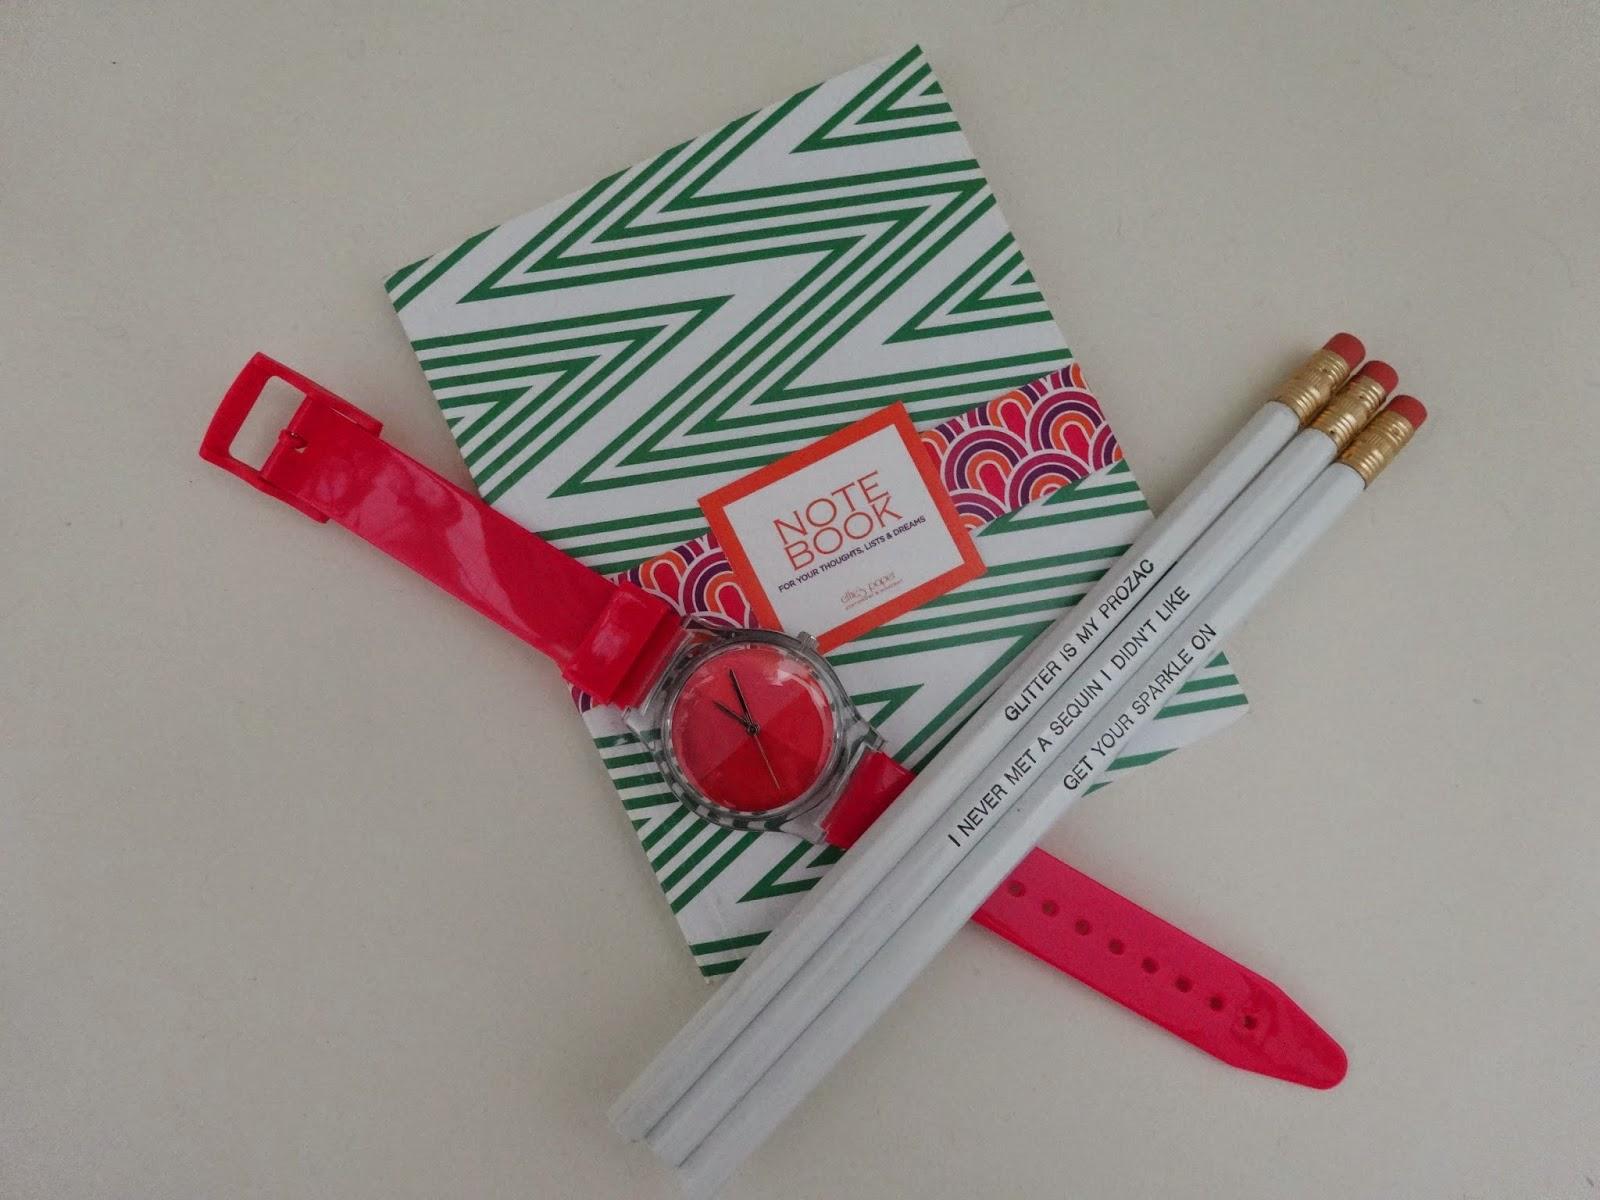 Effie's Paper, Pencils, Desk Accessories, Glitter